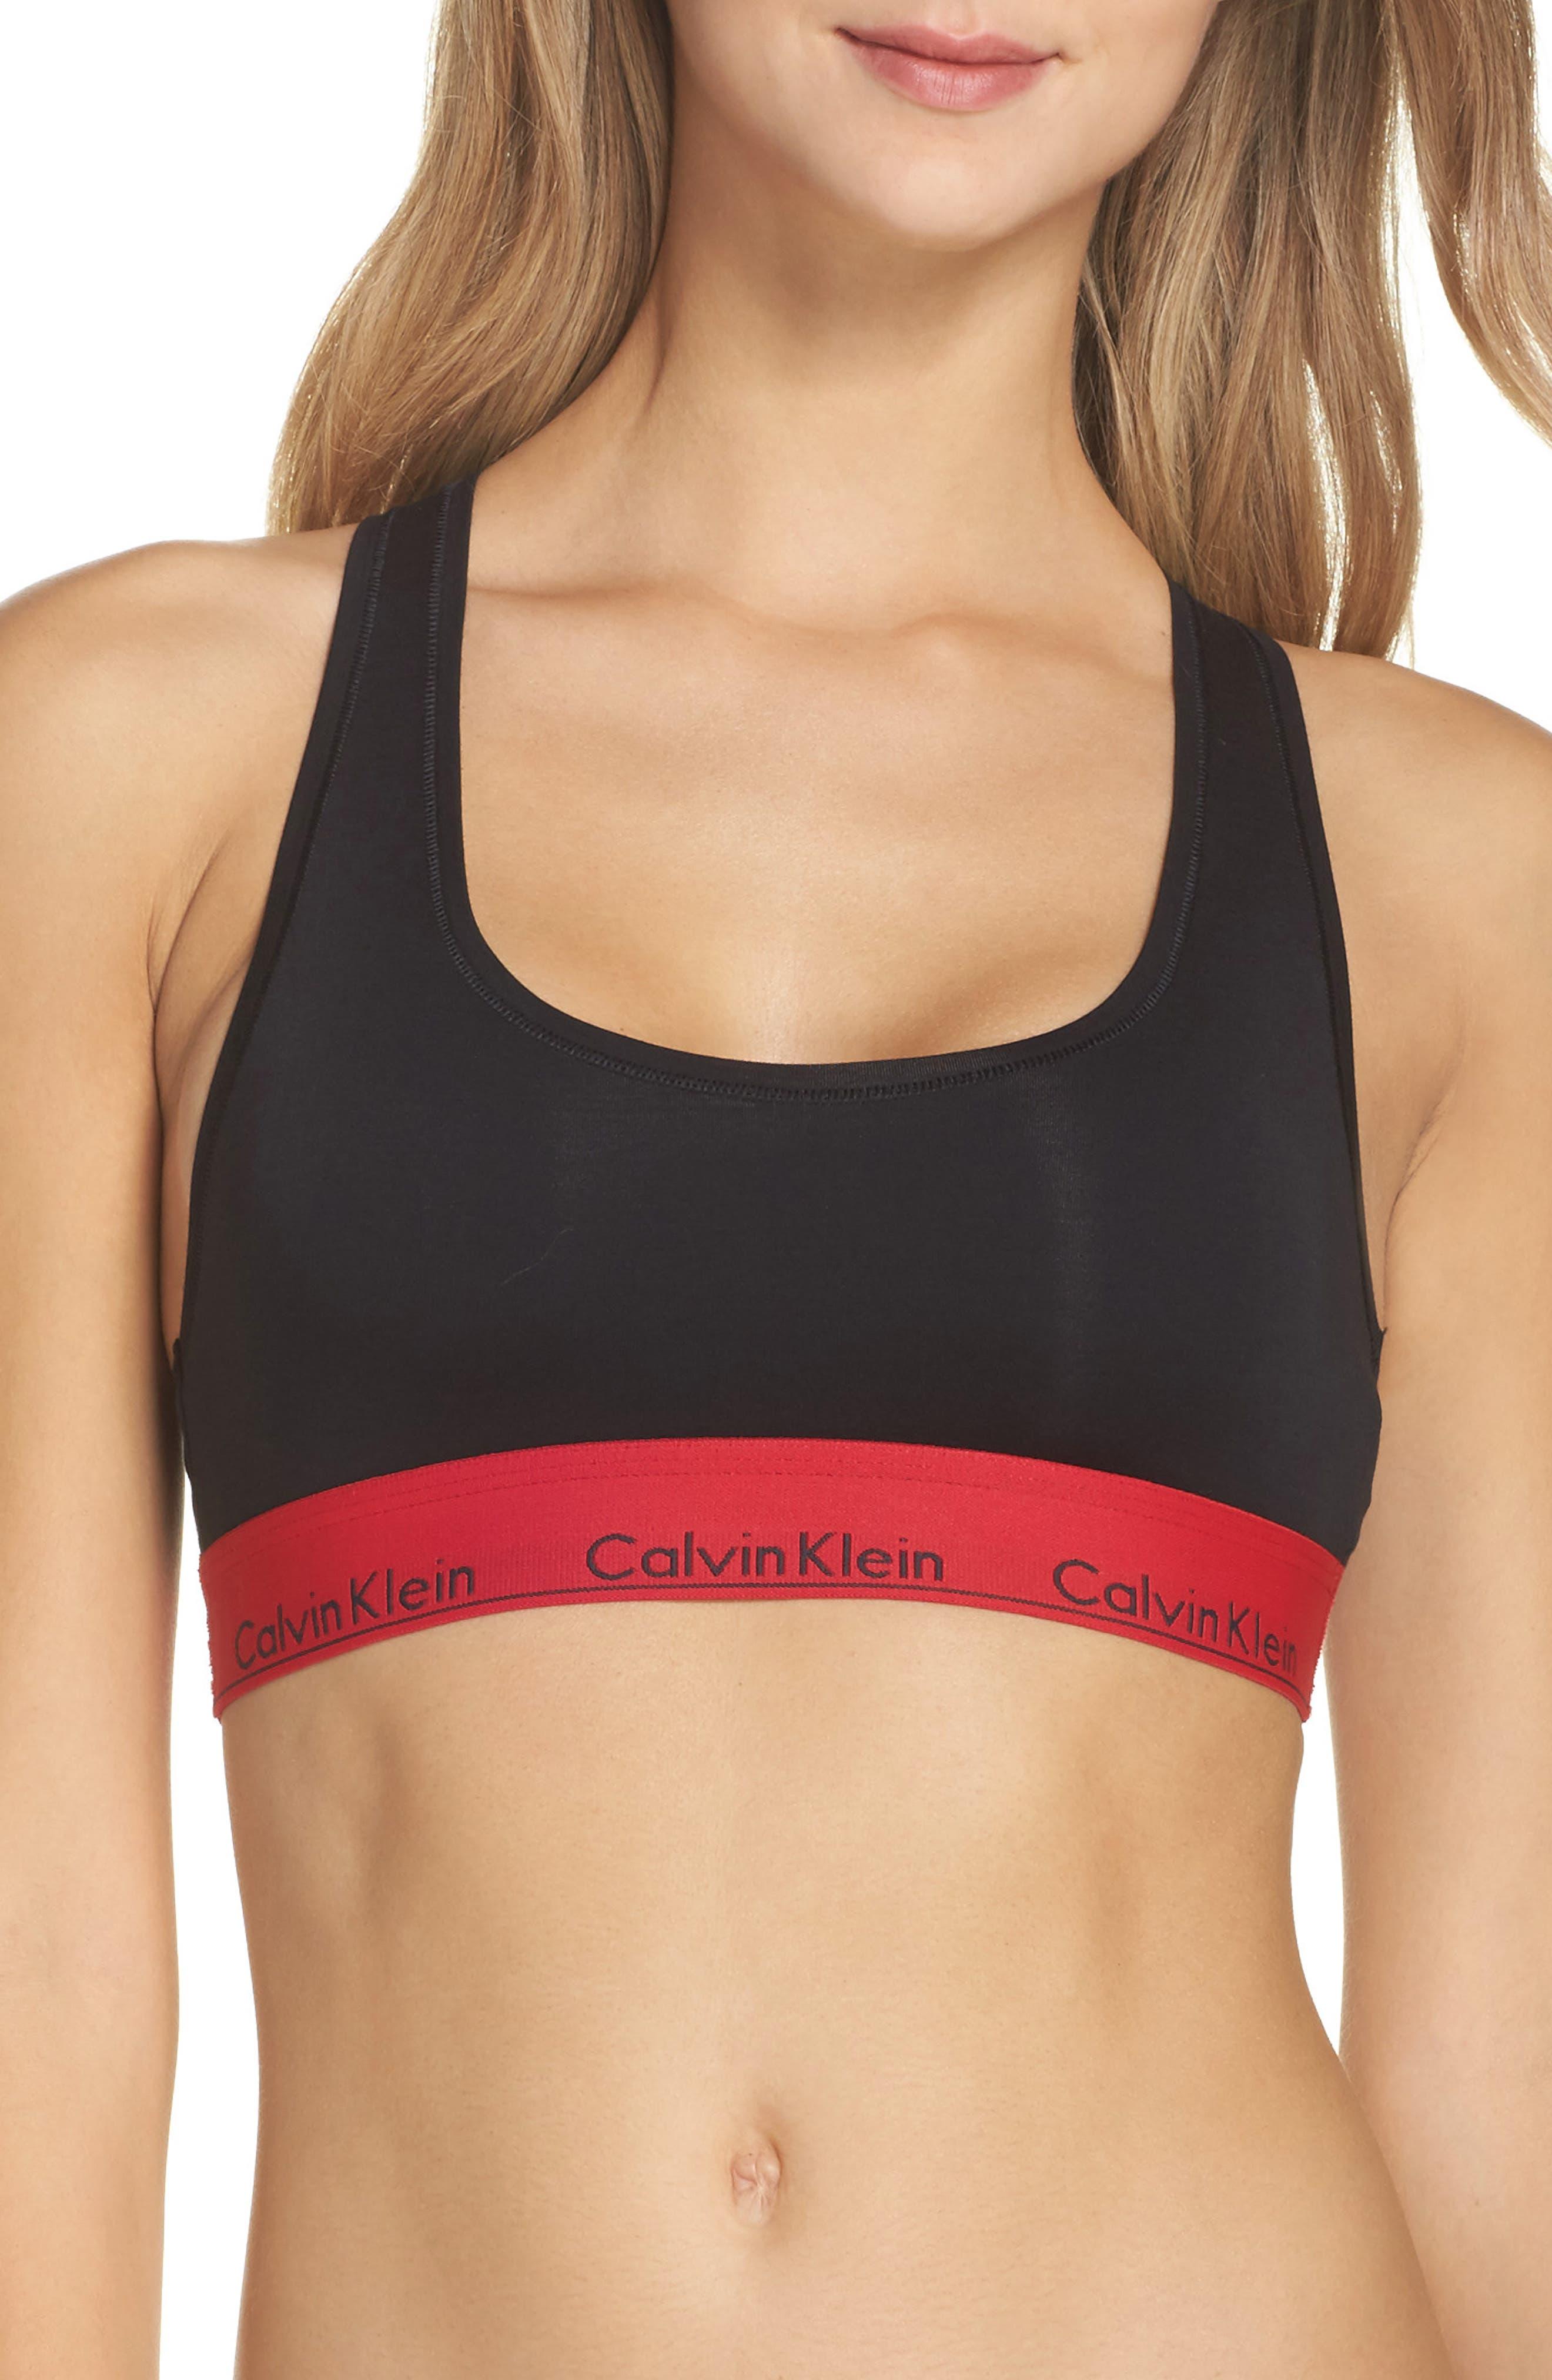 Calvin Klein Modern Cotton Collection Cotton Blend Racerback Bralette